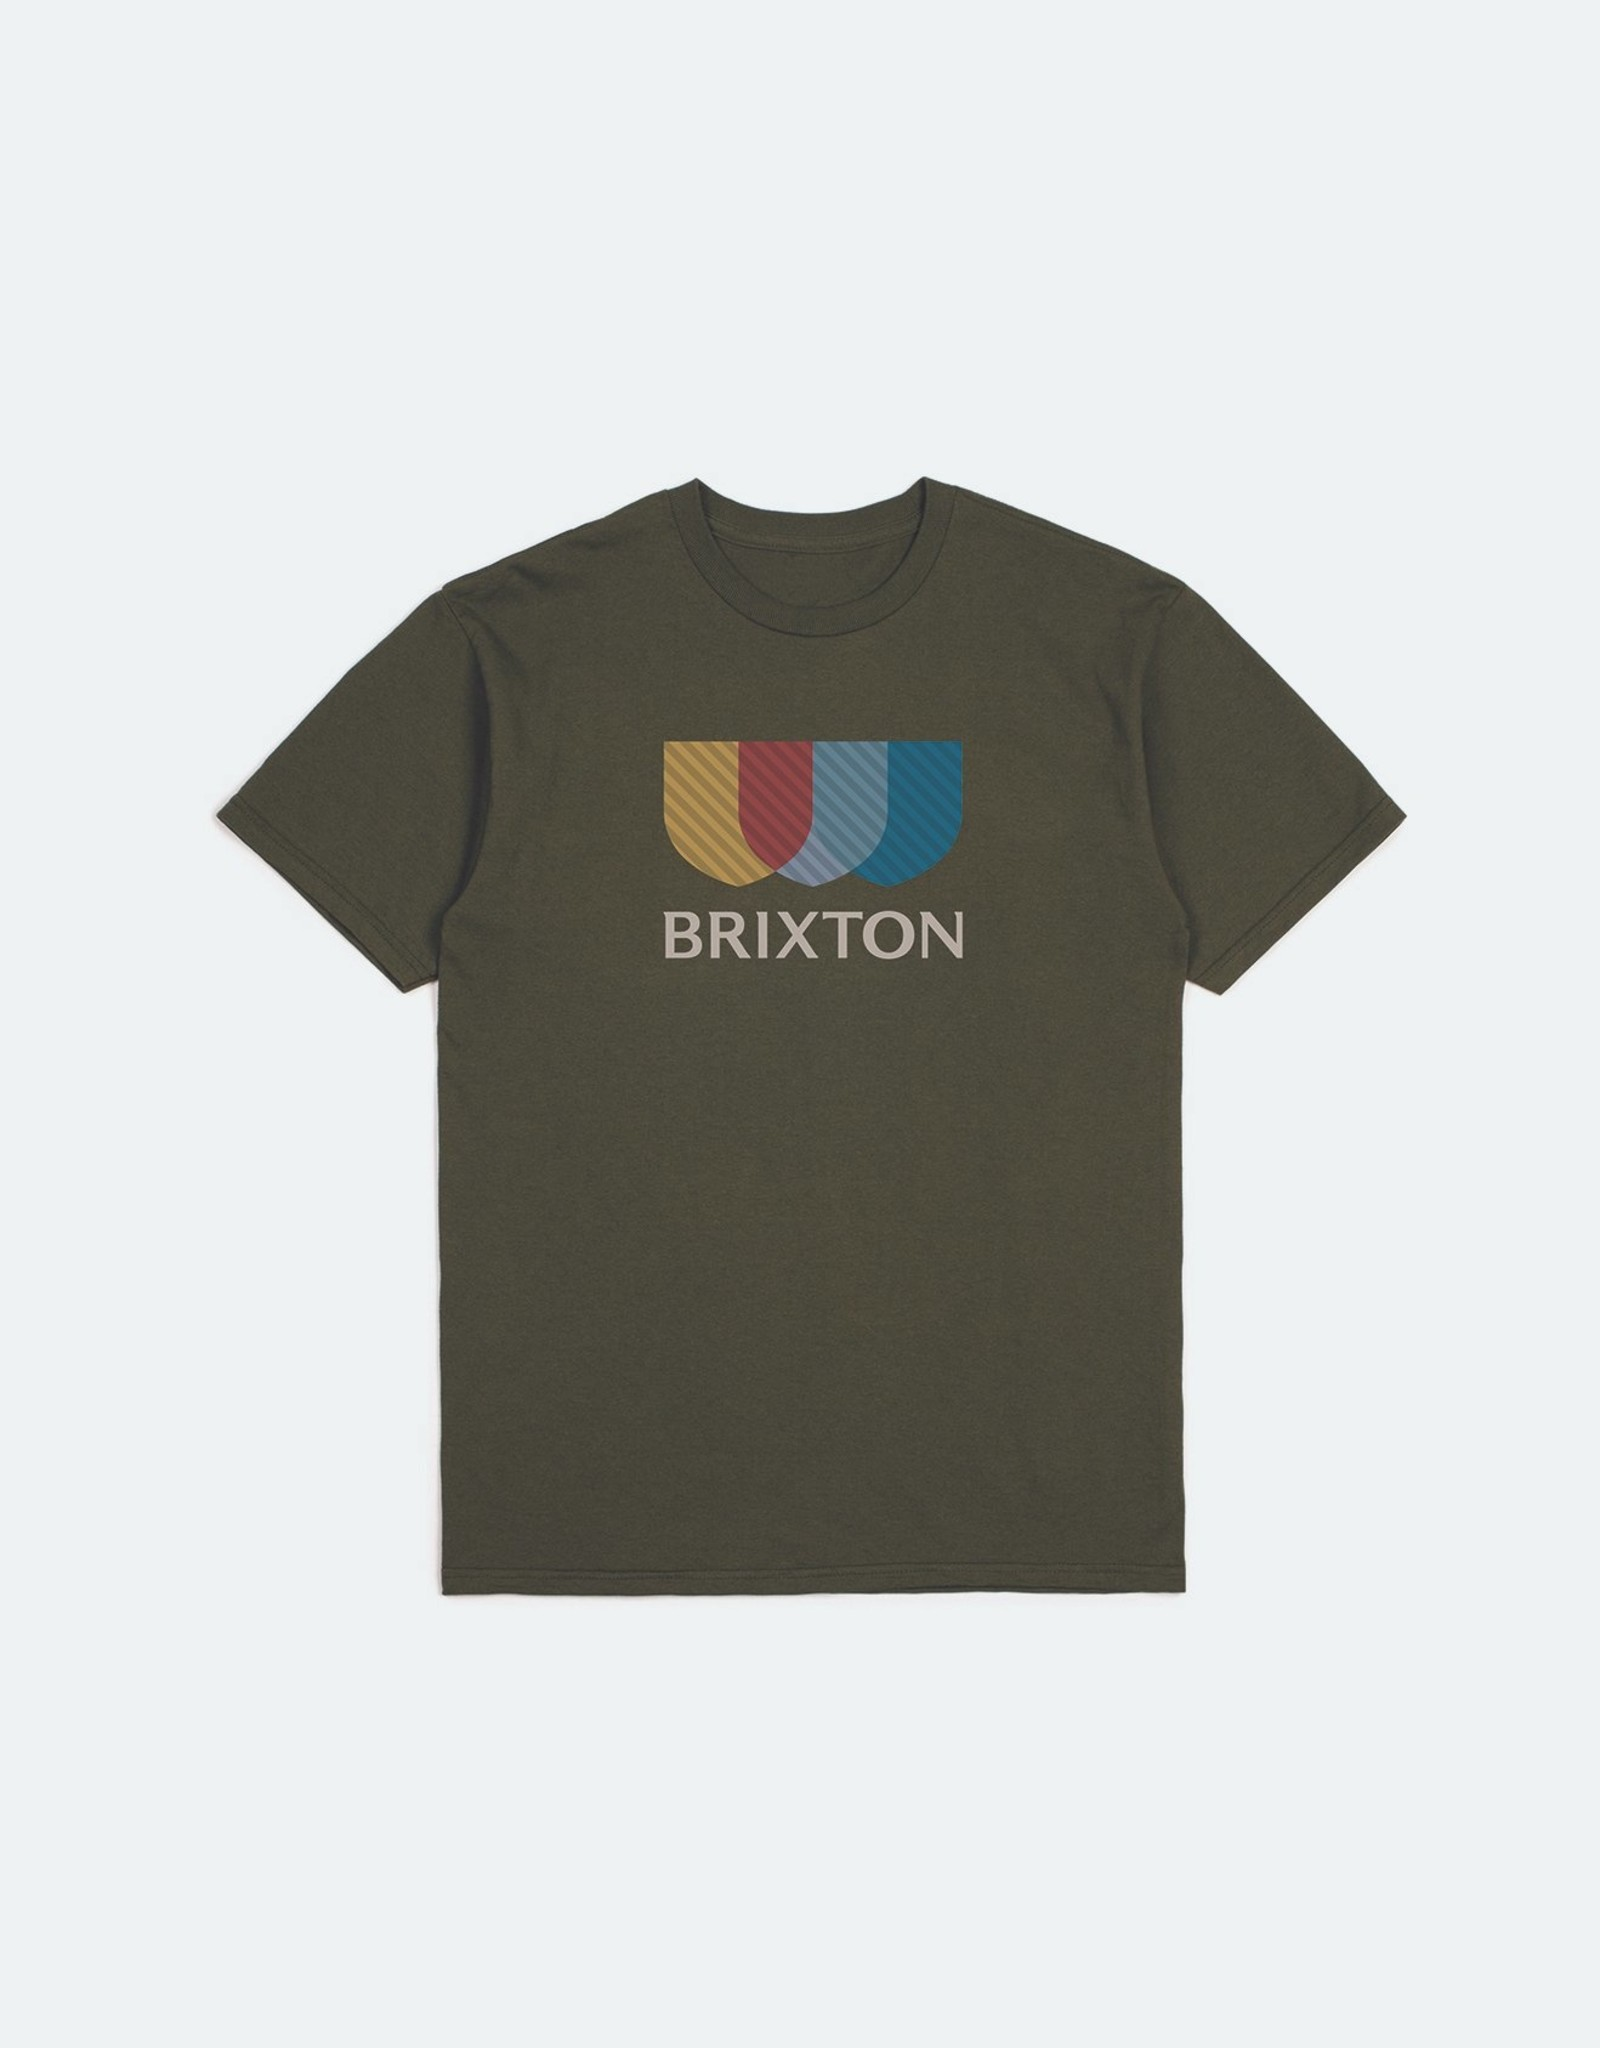 Brixton BRIXTON ALTON STRIPE S/S STT  MILITARY OLIVE